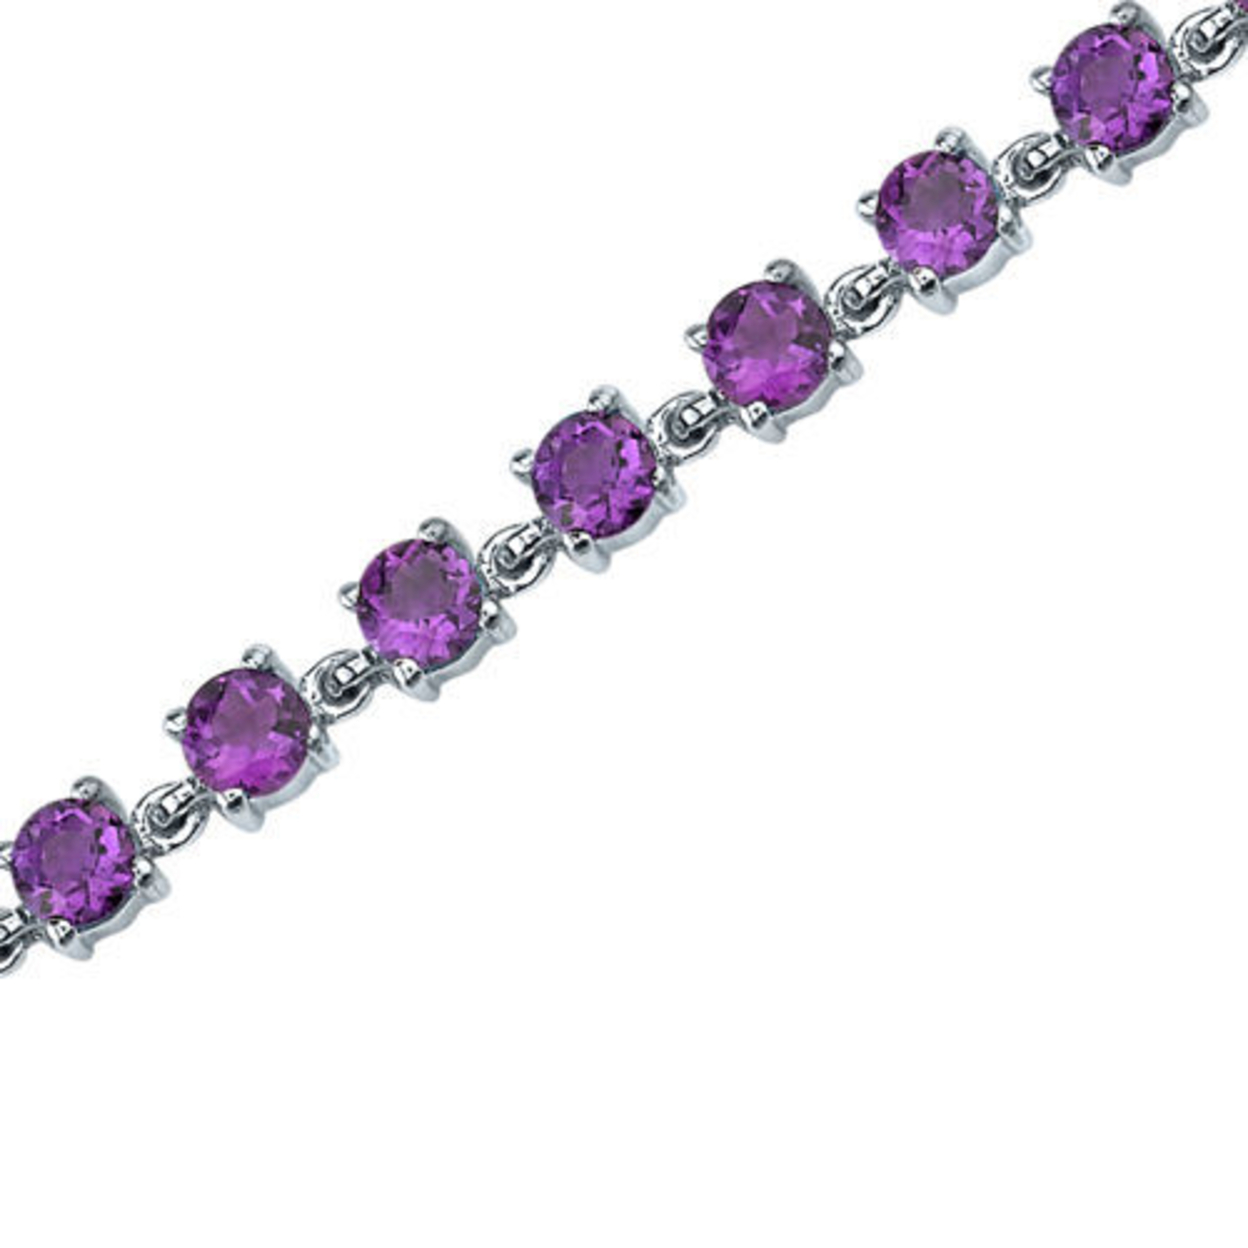 6.00 Carats Round Shape Amethyst Bracelet In Sterling Silver Style Sb3670